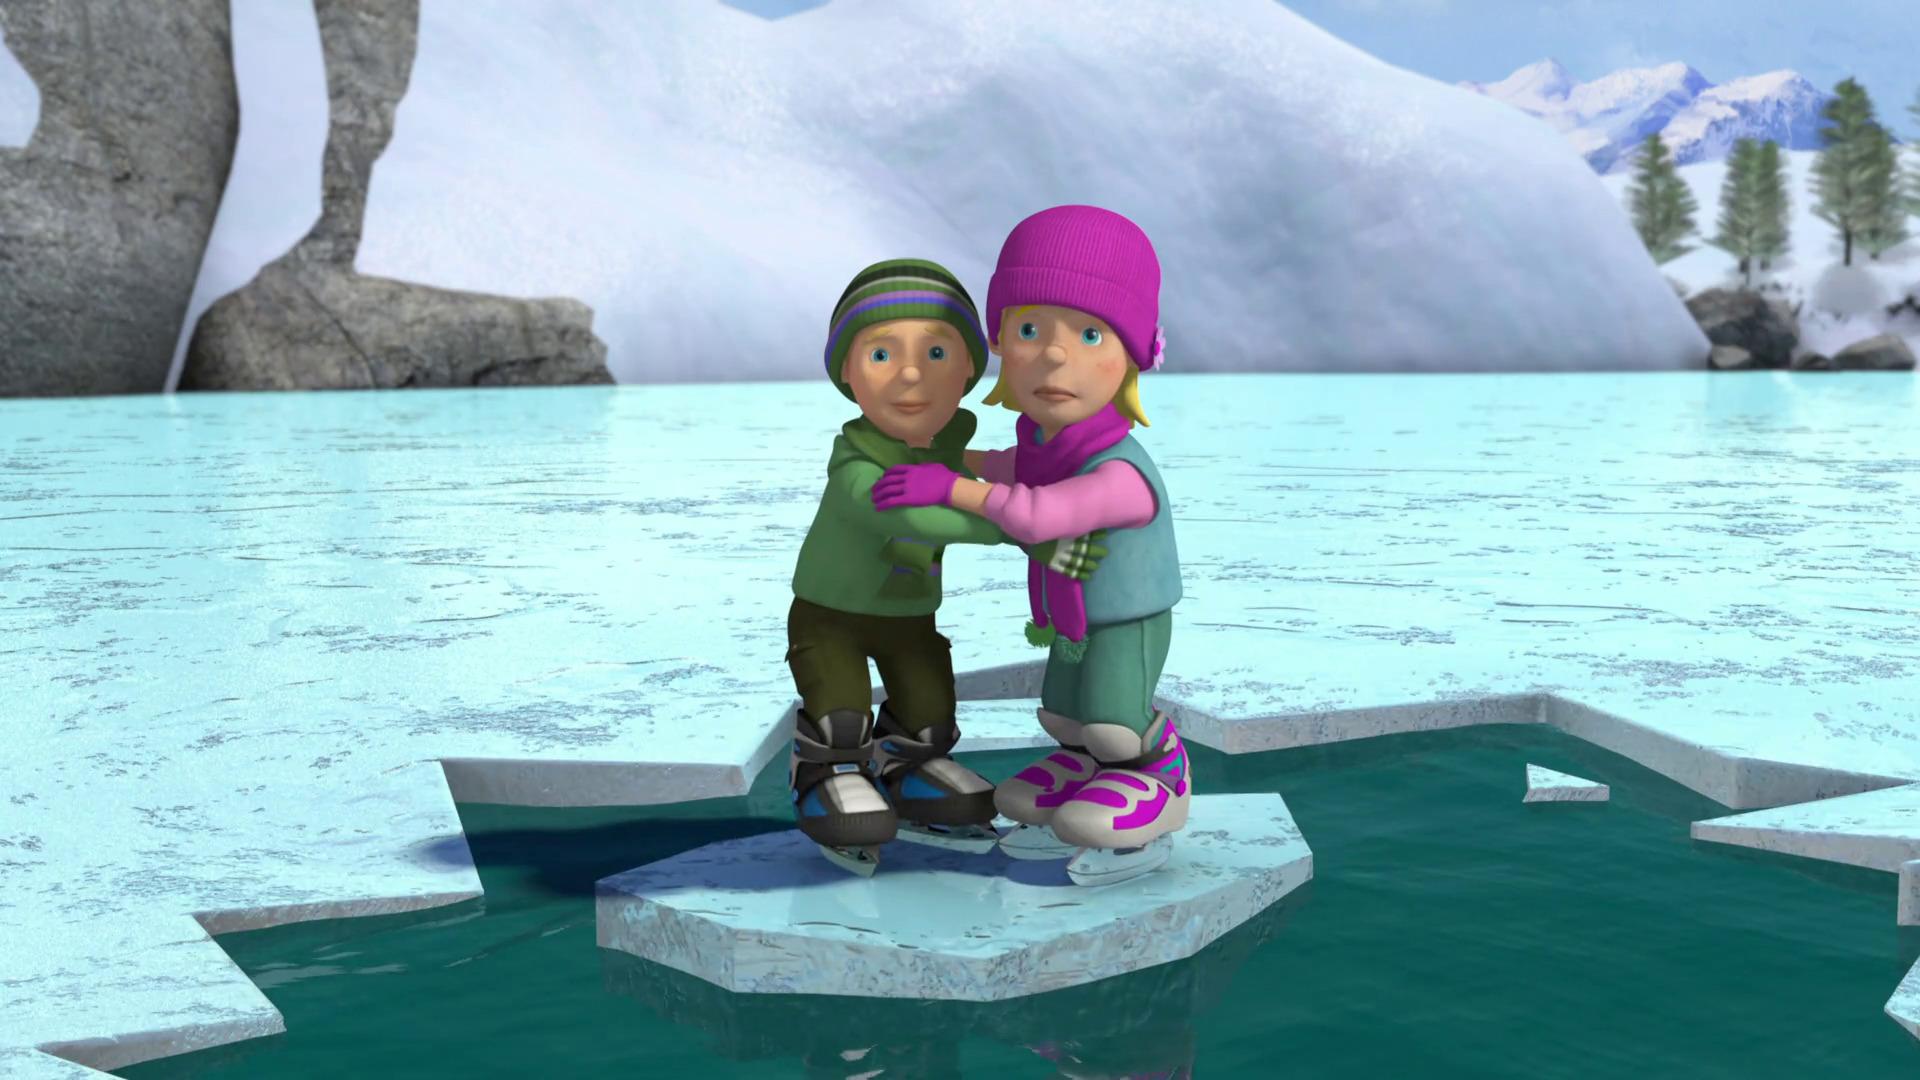 Temporada 9 T9 - C4: Sobre hielo